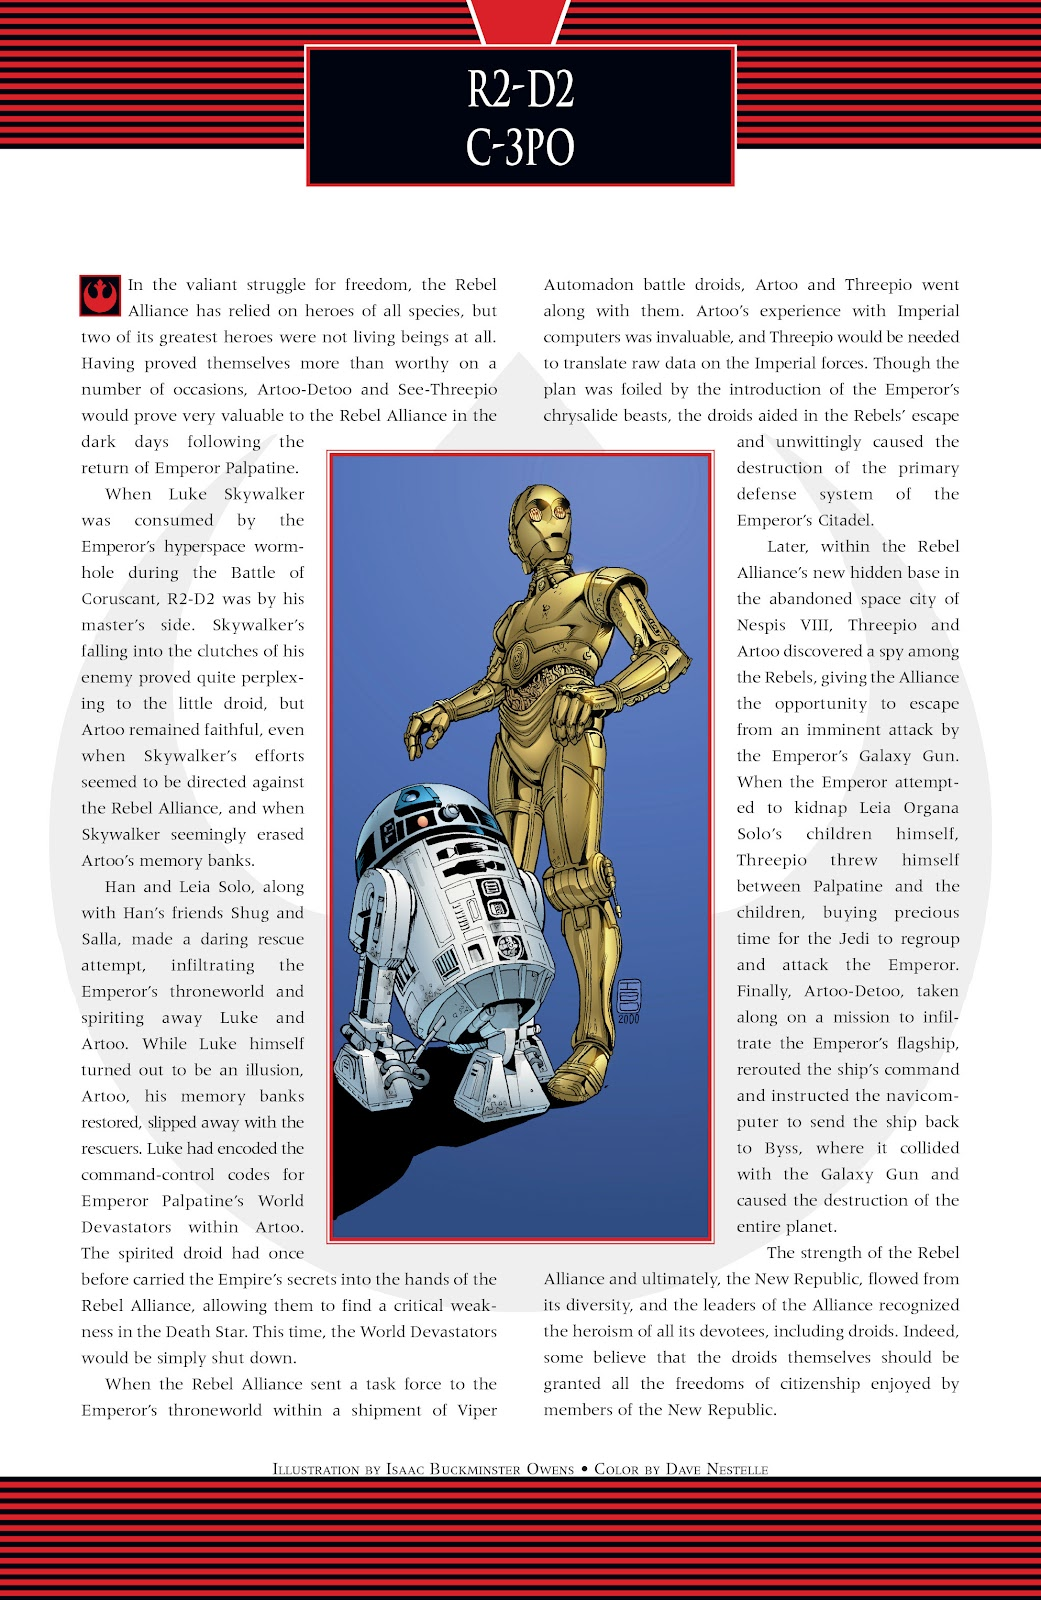 Read online Star Wars: Dark Empire Trilogy comic -  Issue # TPB (Part 4) - 76